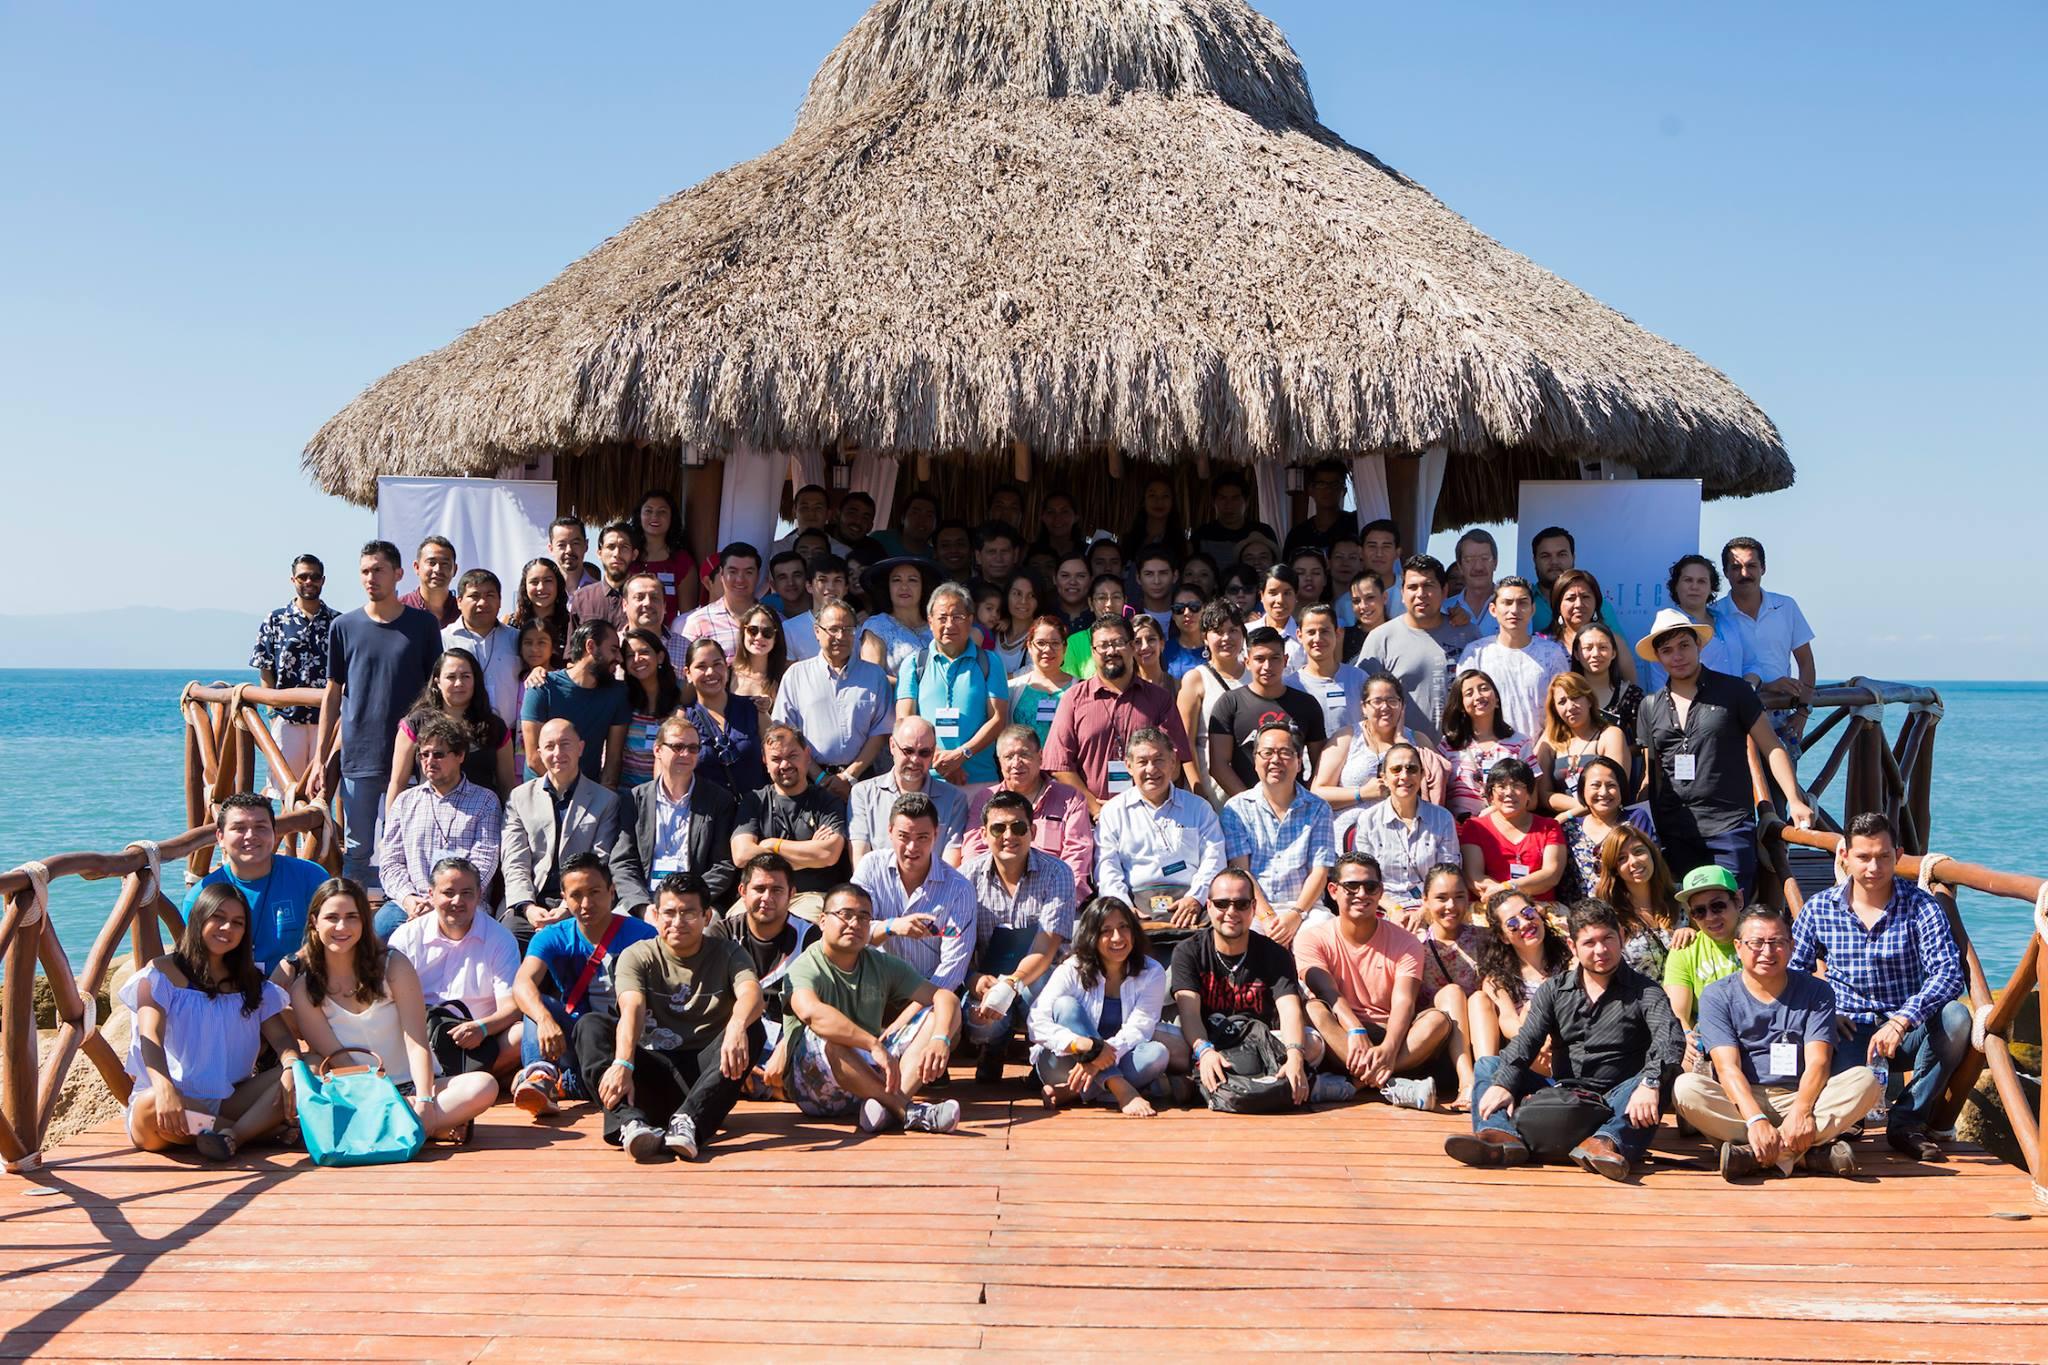 Organizadores y participantes de la doceava edición de Nanotech 2016